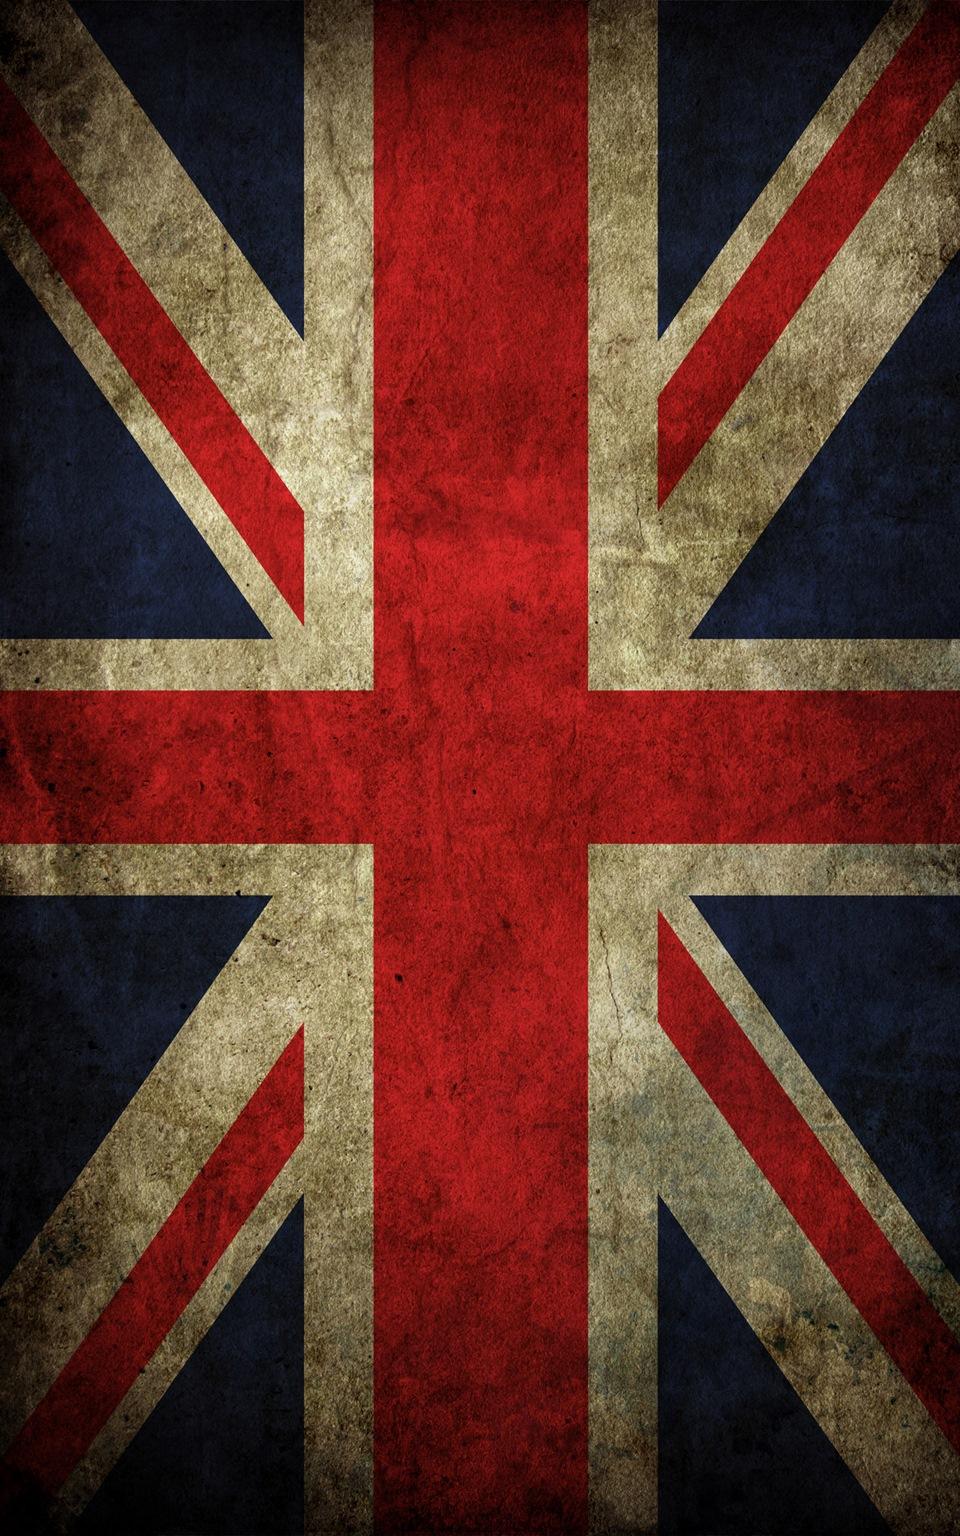 The Beatles Iphone 5 Wallpaper Закатал крышу под Британский флаг Сообщество